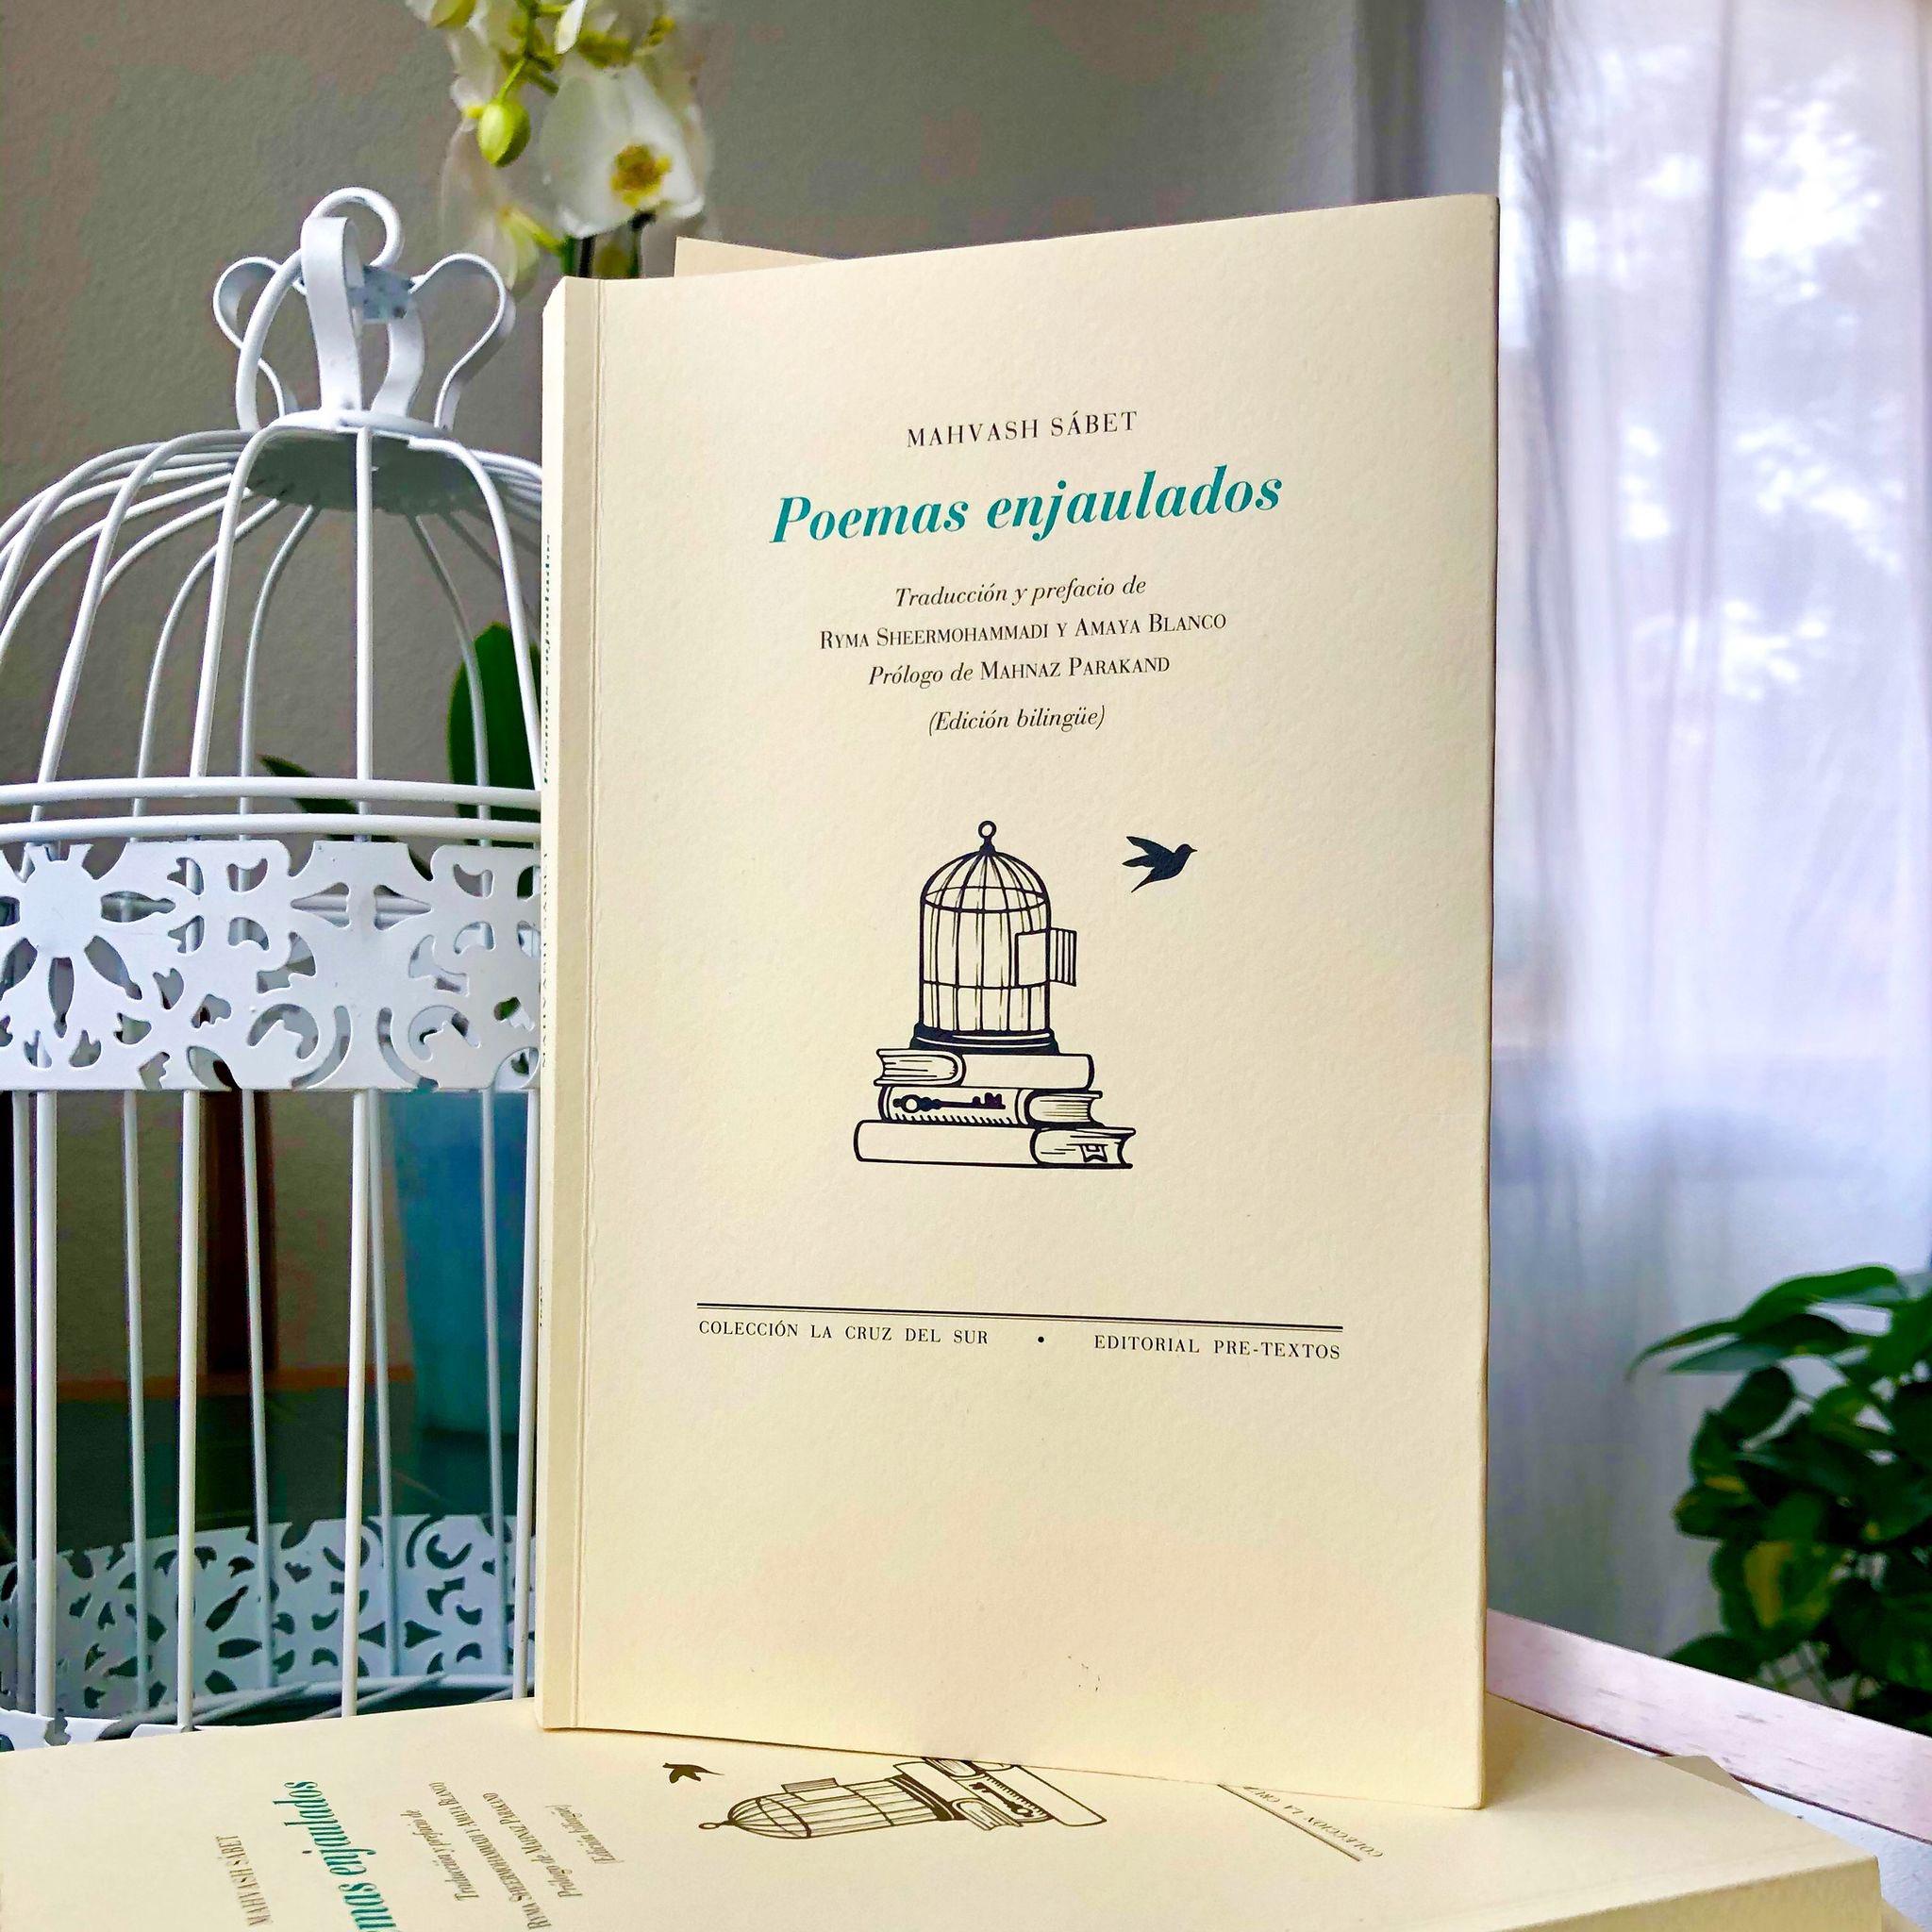 "Ryma Sheermohammadi على تويتر: ""Un honor haber co-traducido una obra que un  ejemplo de resiliencia. #LosPoemasEnjauladosde de #Mahvash_Sábet  Acompañanos! 🗓 23 abril 19h 📍@cbamadrid 🖥 https://t.co/VdDuK6J4Lq  #DiaDelLibro2021 @PreTextosLibros ..."